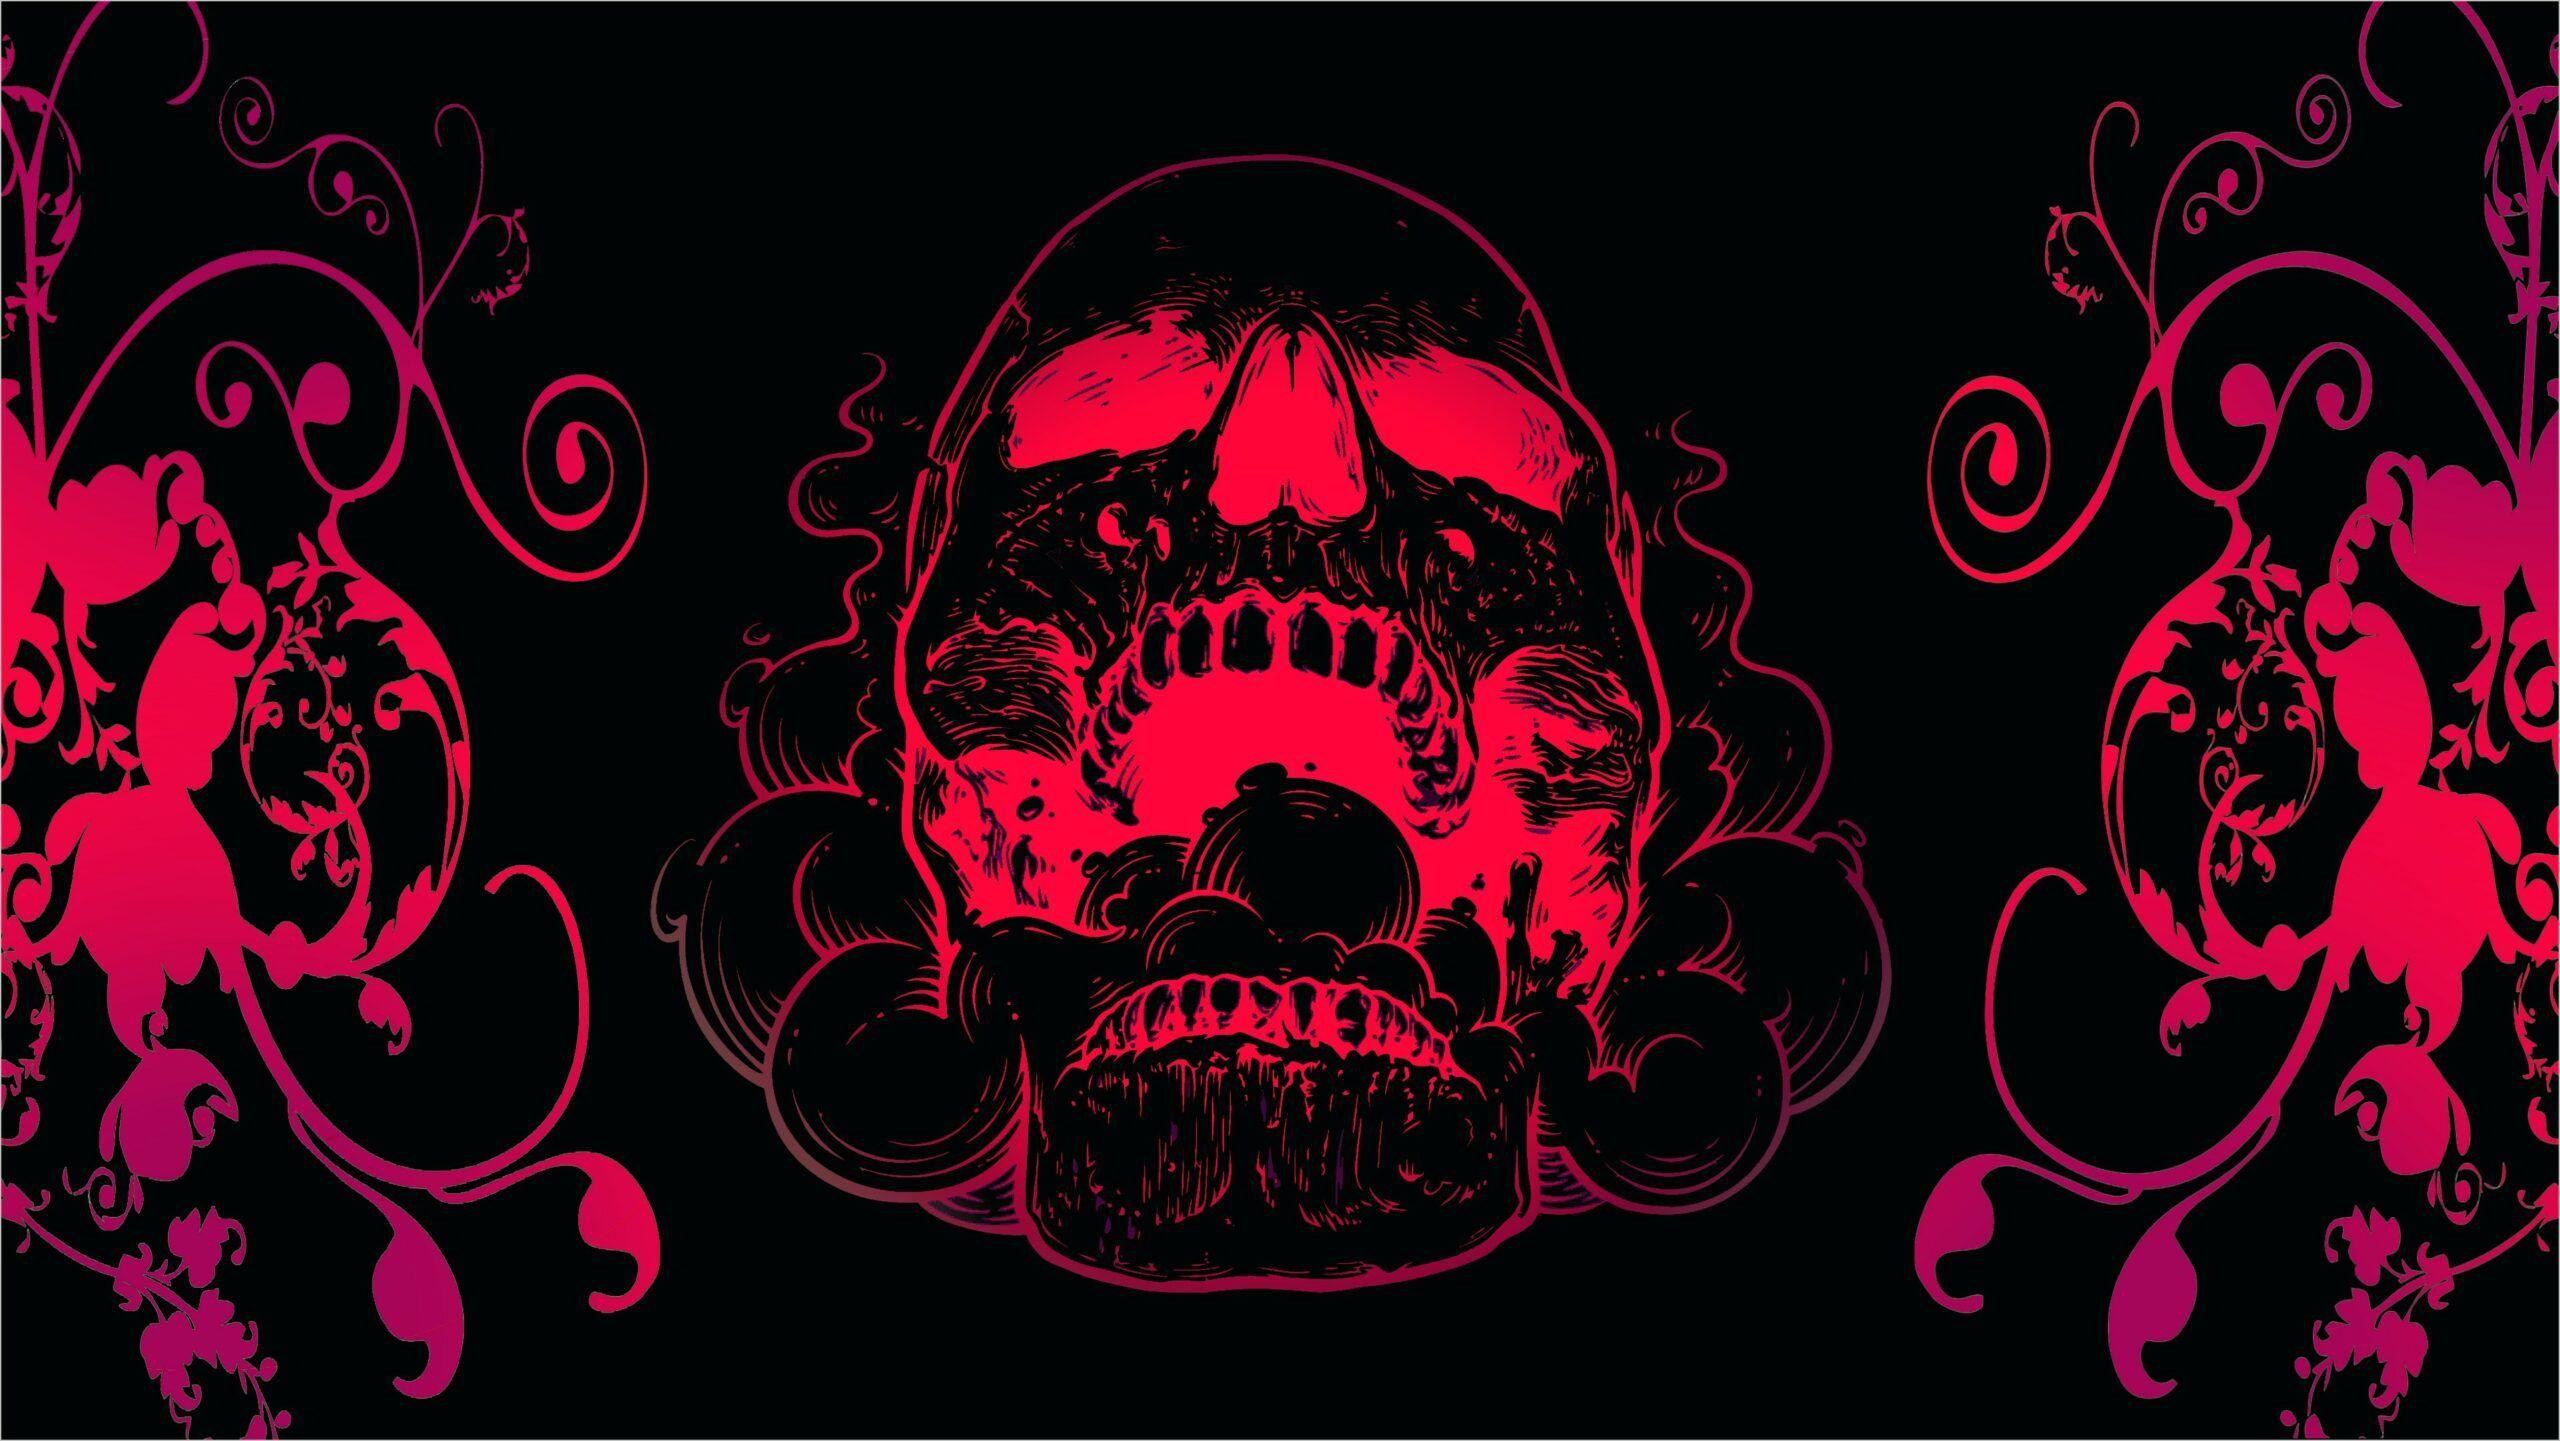 Skull Black Wallpaper 4k In 2020 Skull Wallpaper Flowers Black Background Black Skulls Wallpaper